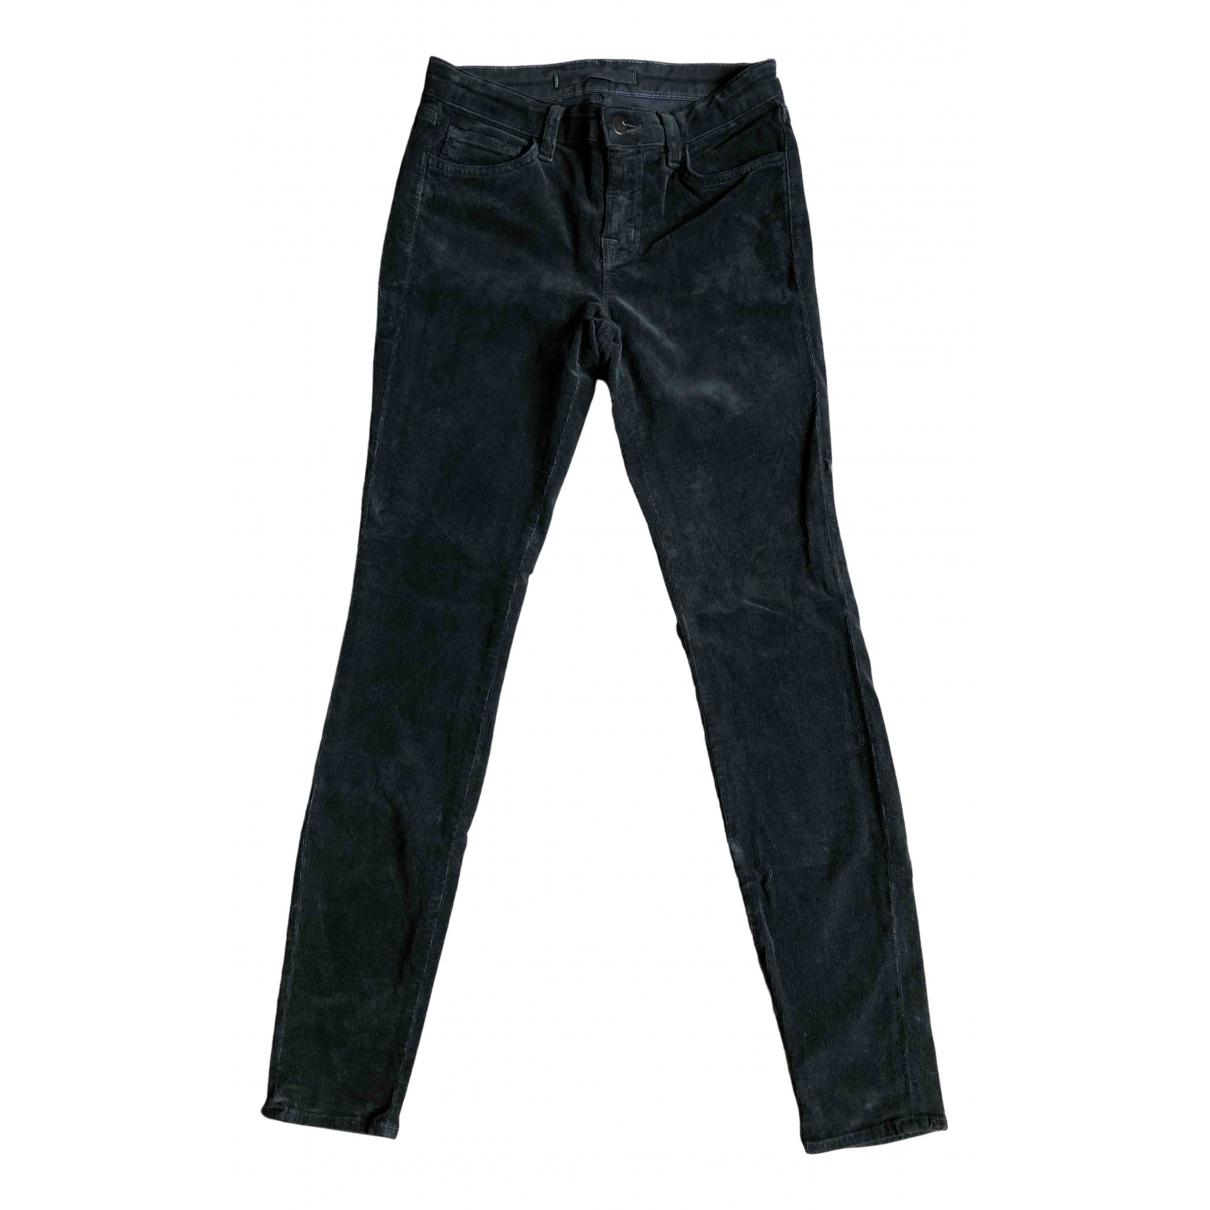 J Brand - Pantalon   pour femme en coton - vert